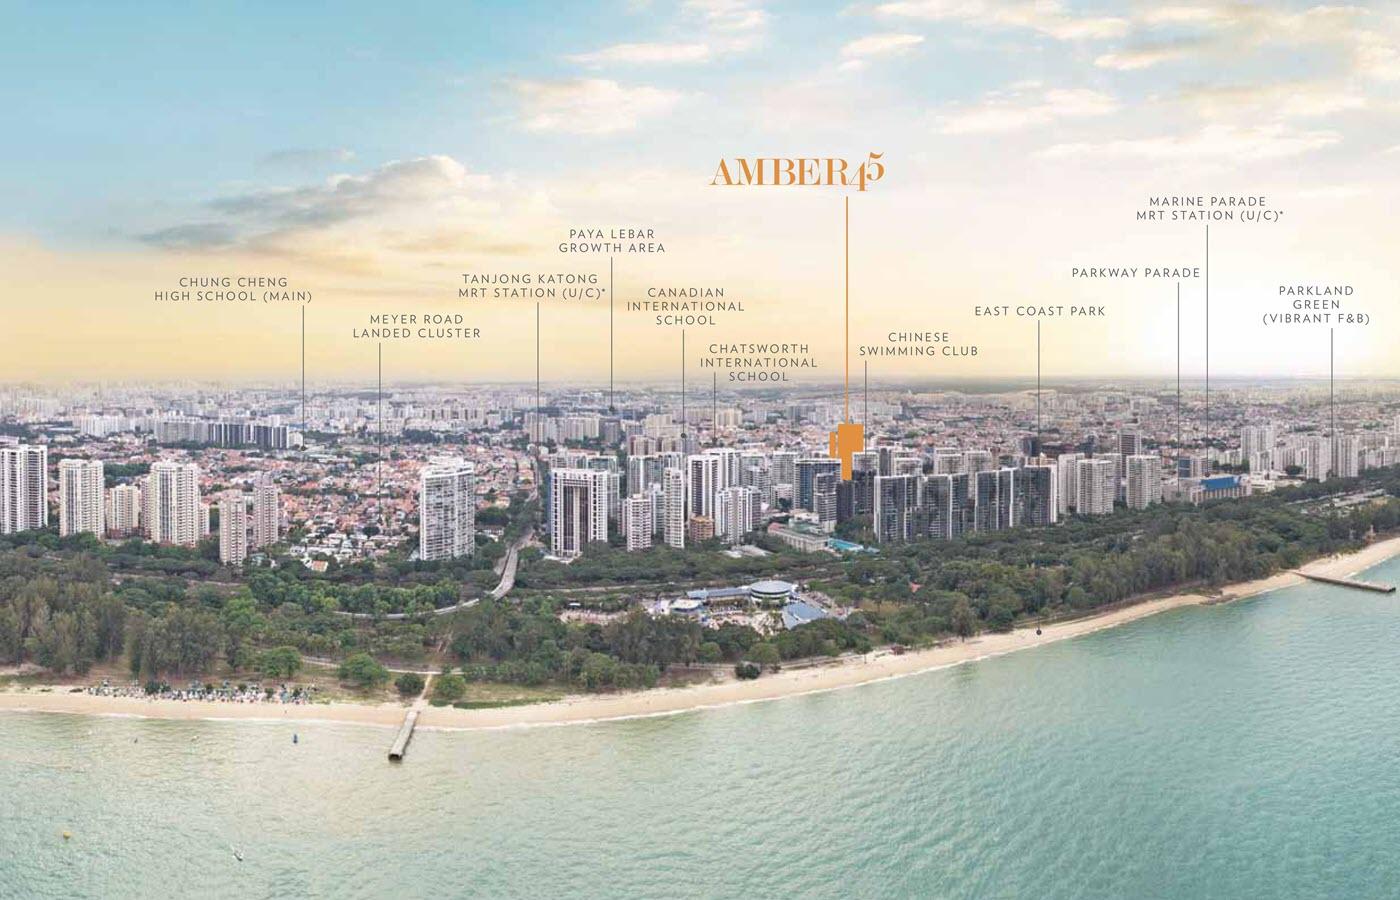 Amber 45 Condo Location Nearby Amenities